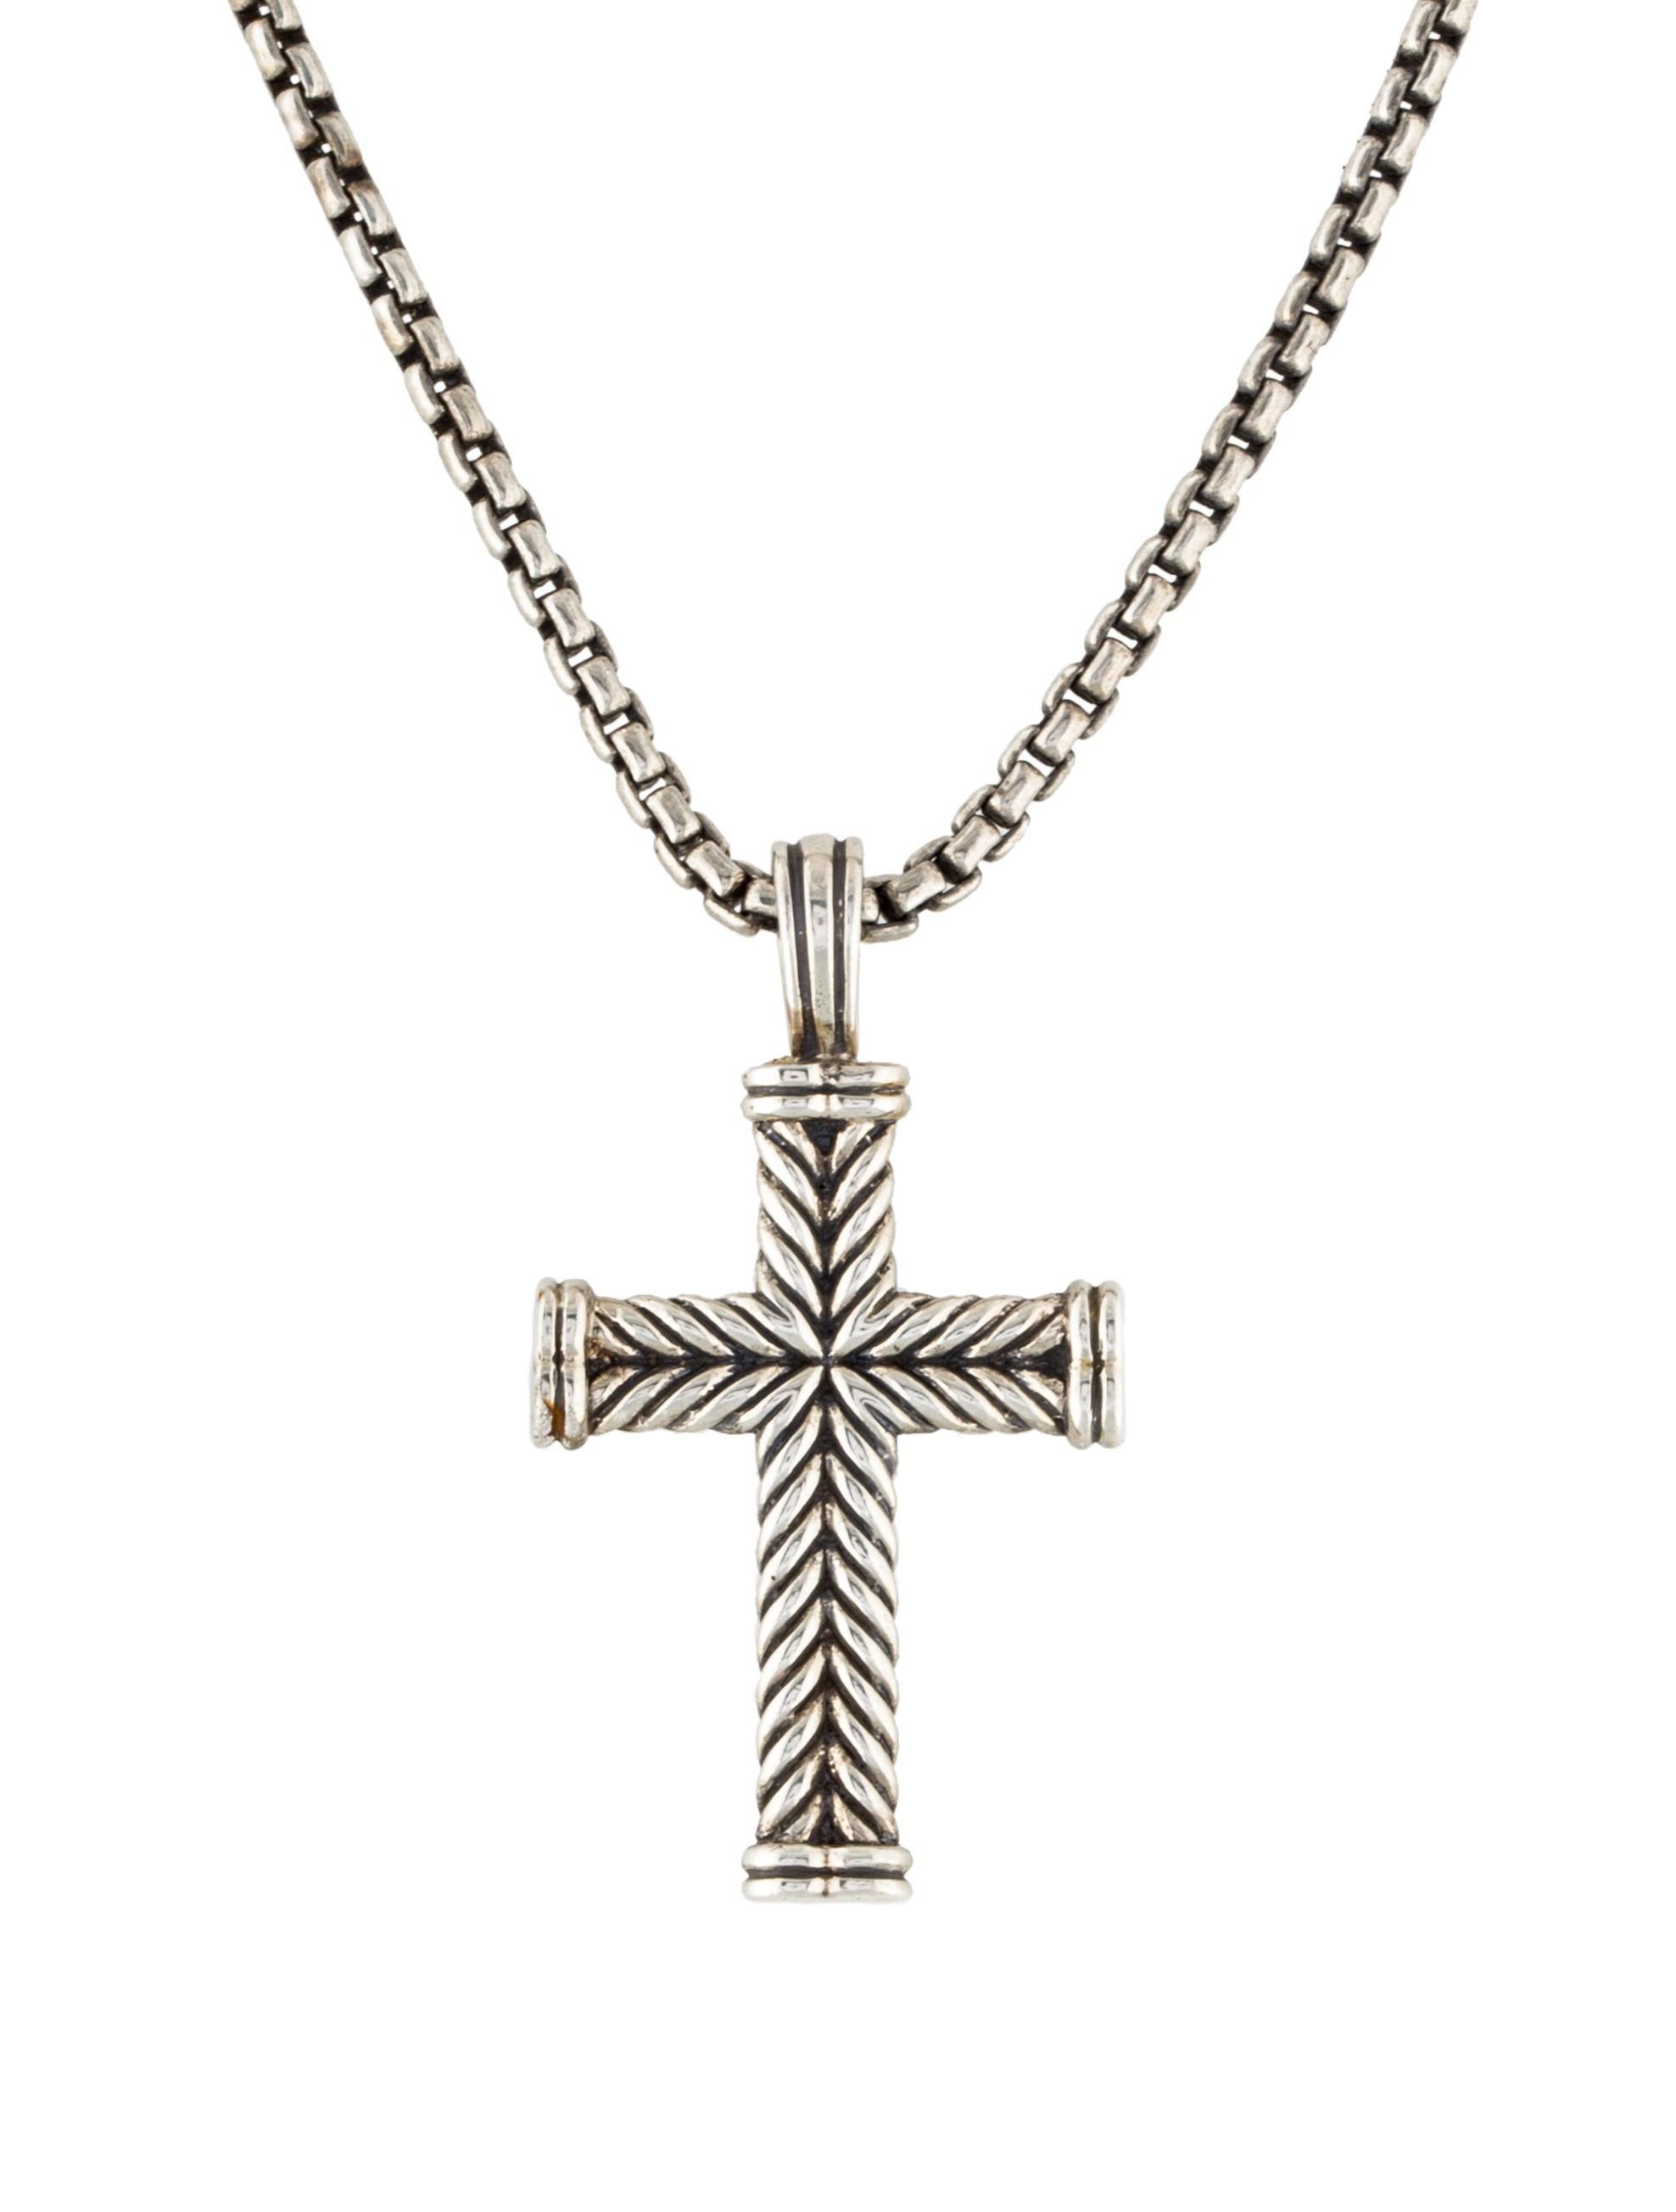 david yurman chevron cross pendant necklace necklaces